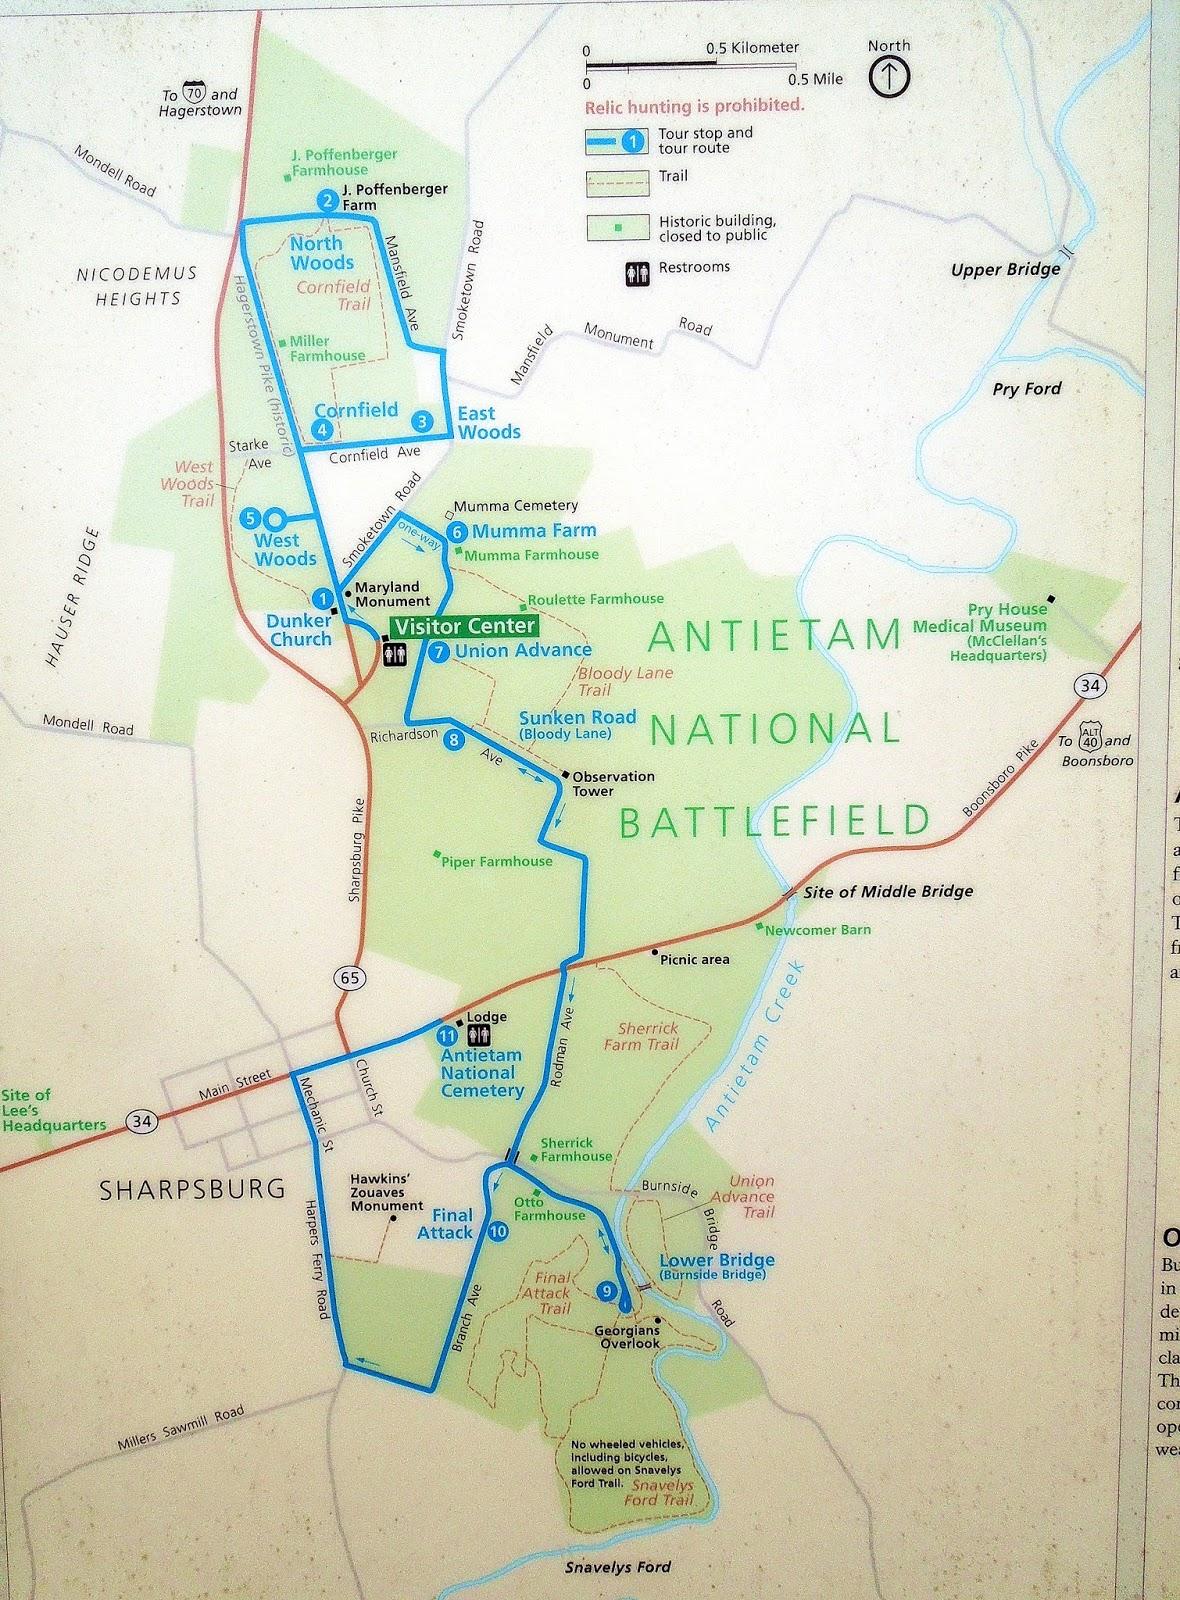 Focusing On Travel Antietam National Battlefield US Civil War - Antietam on us map